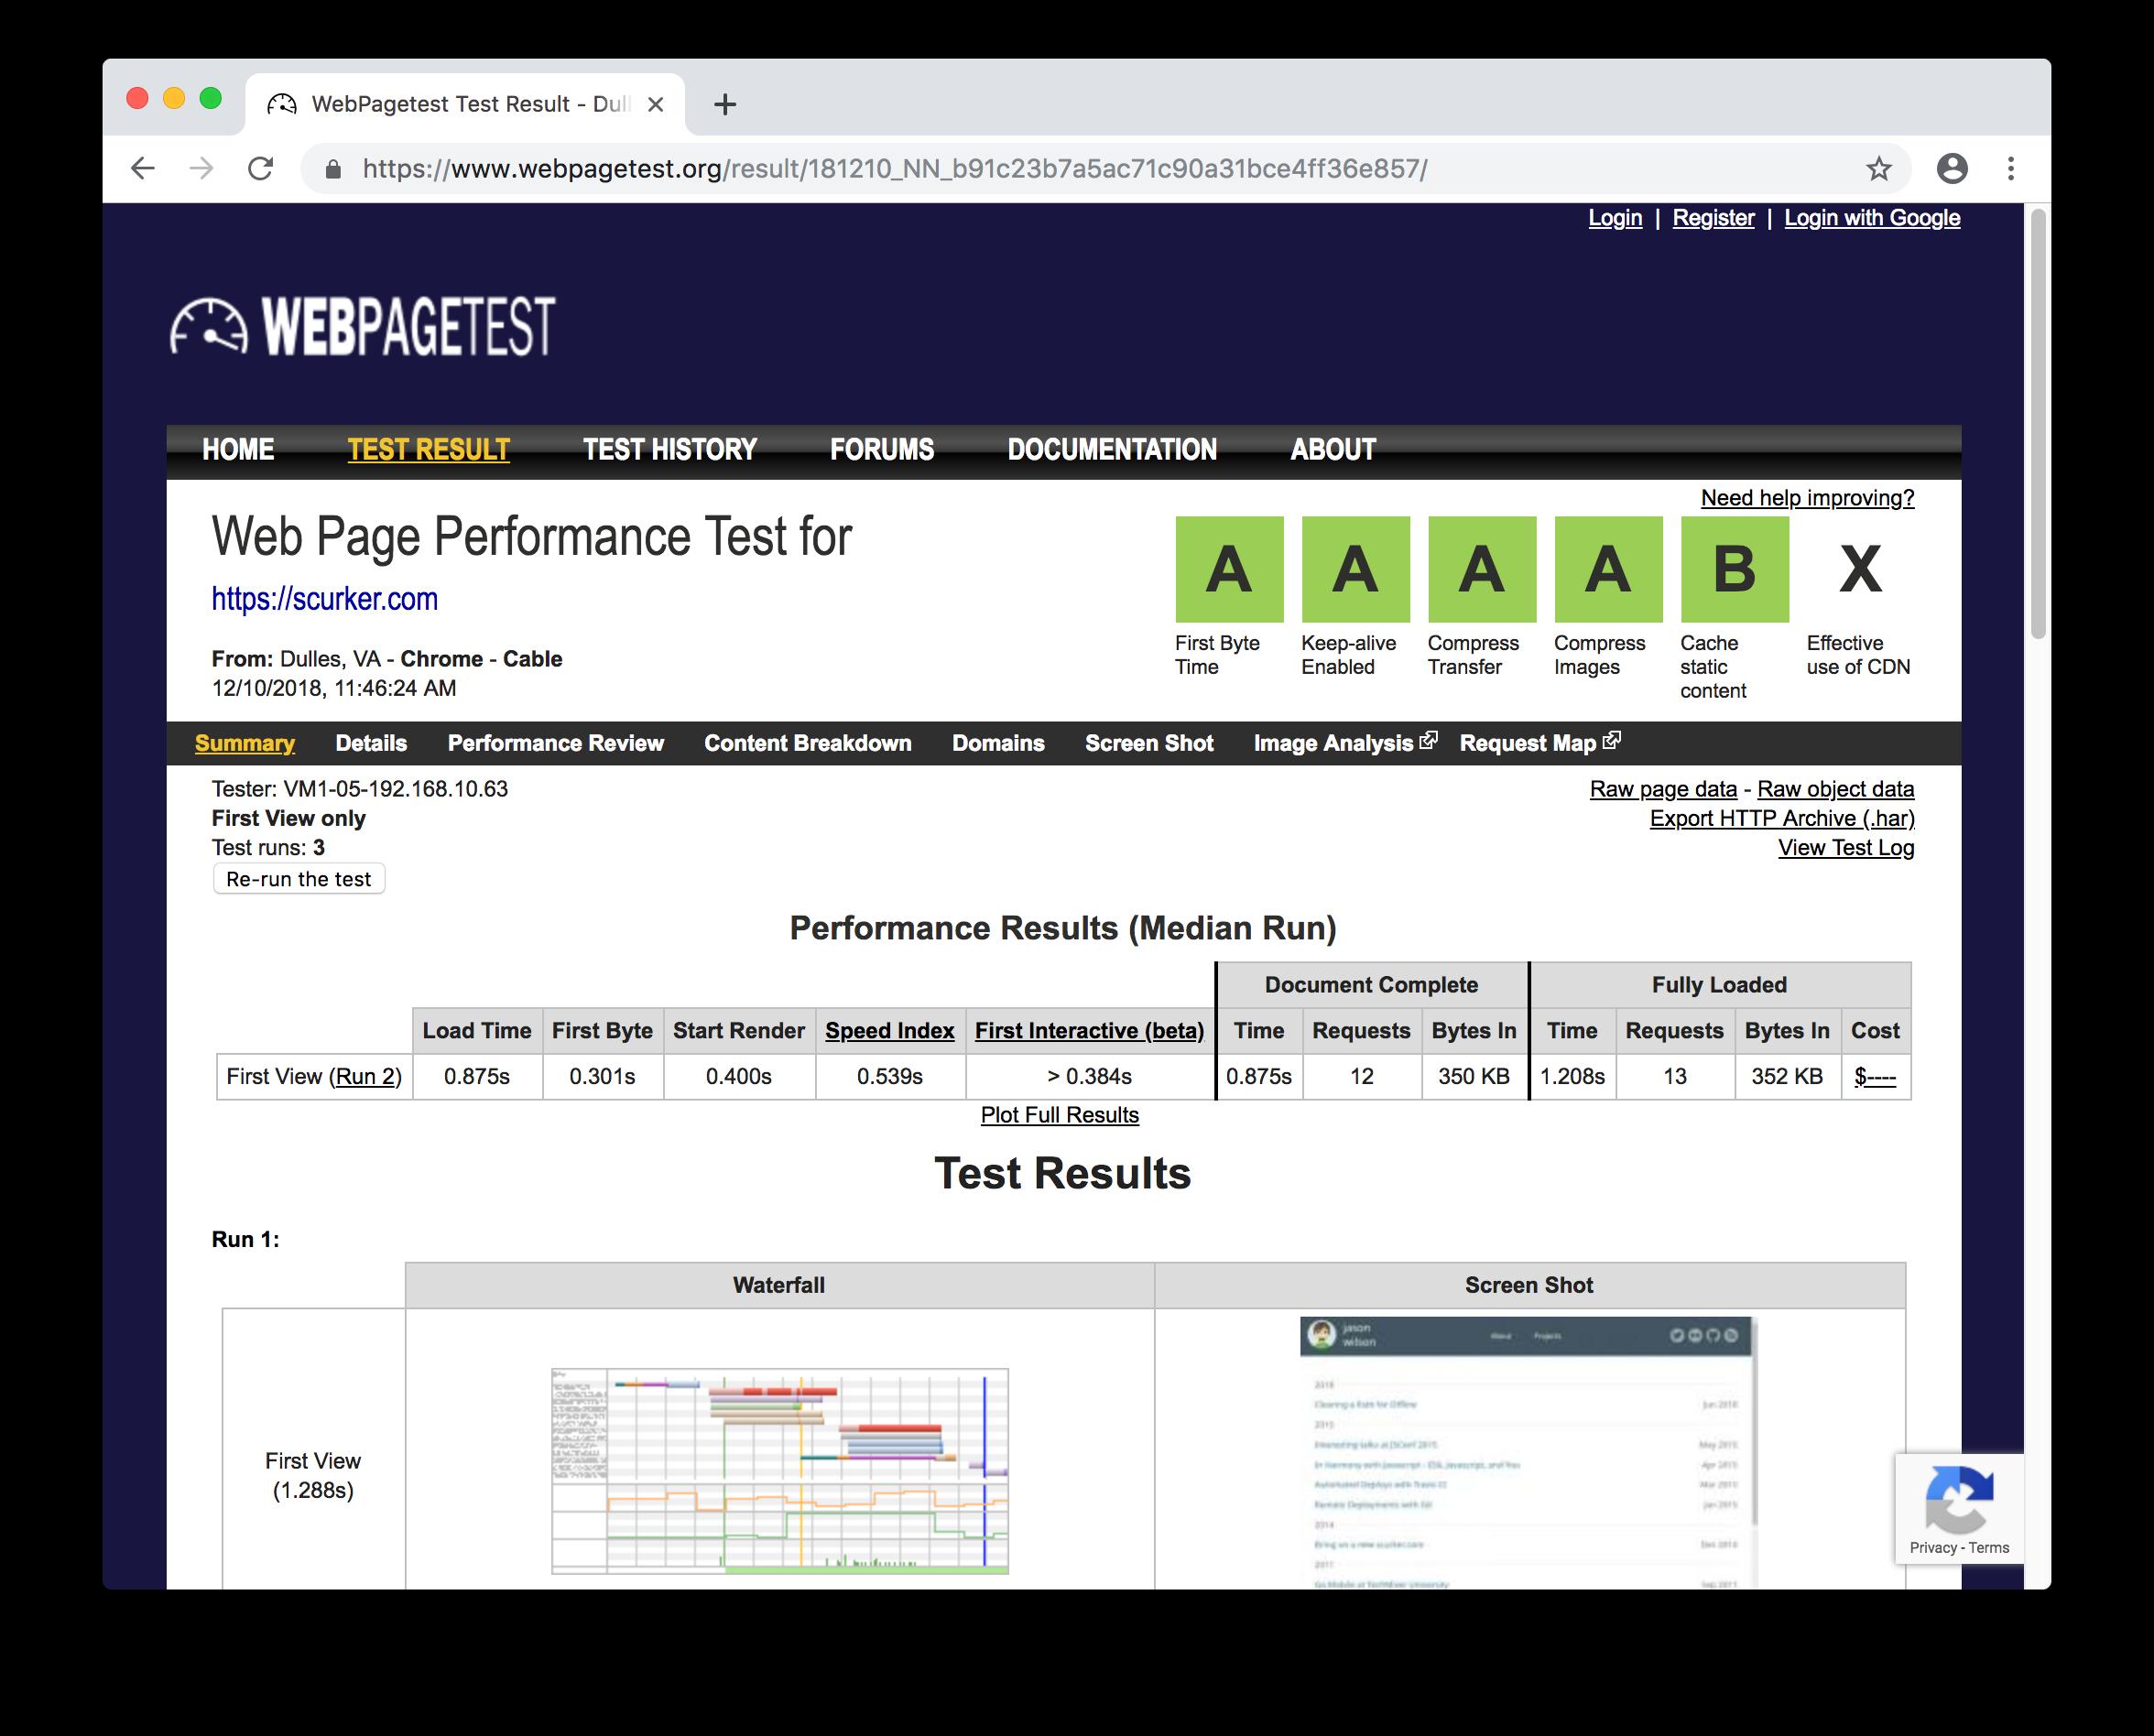 web page test scurker.com results